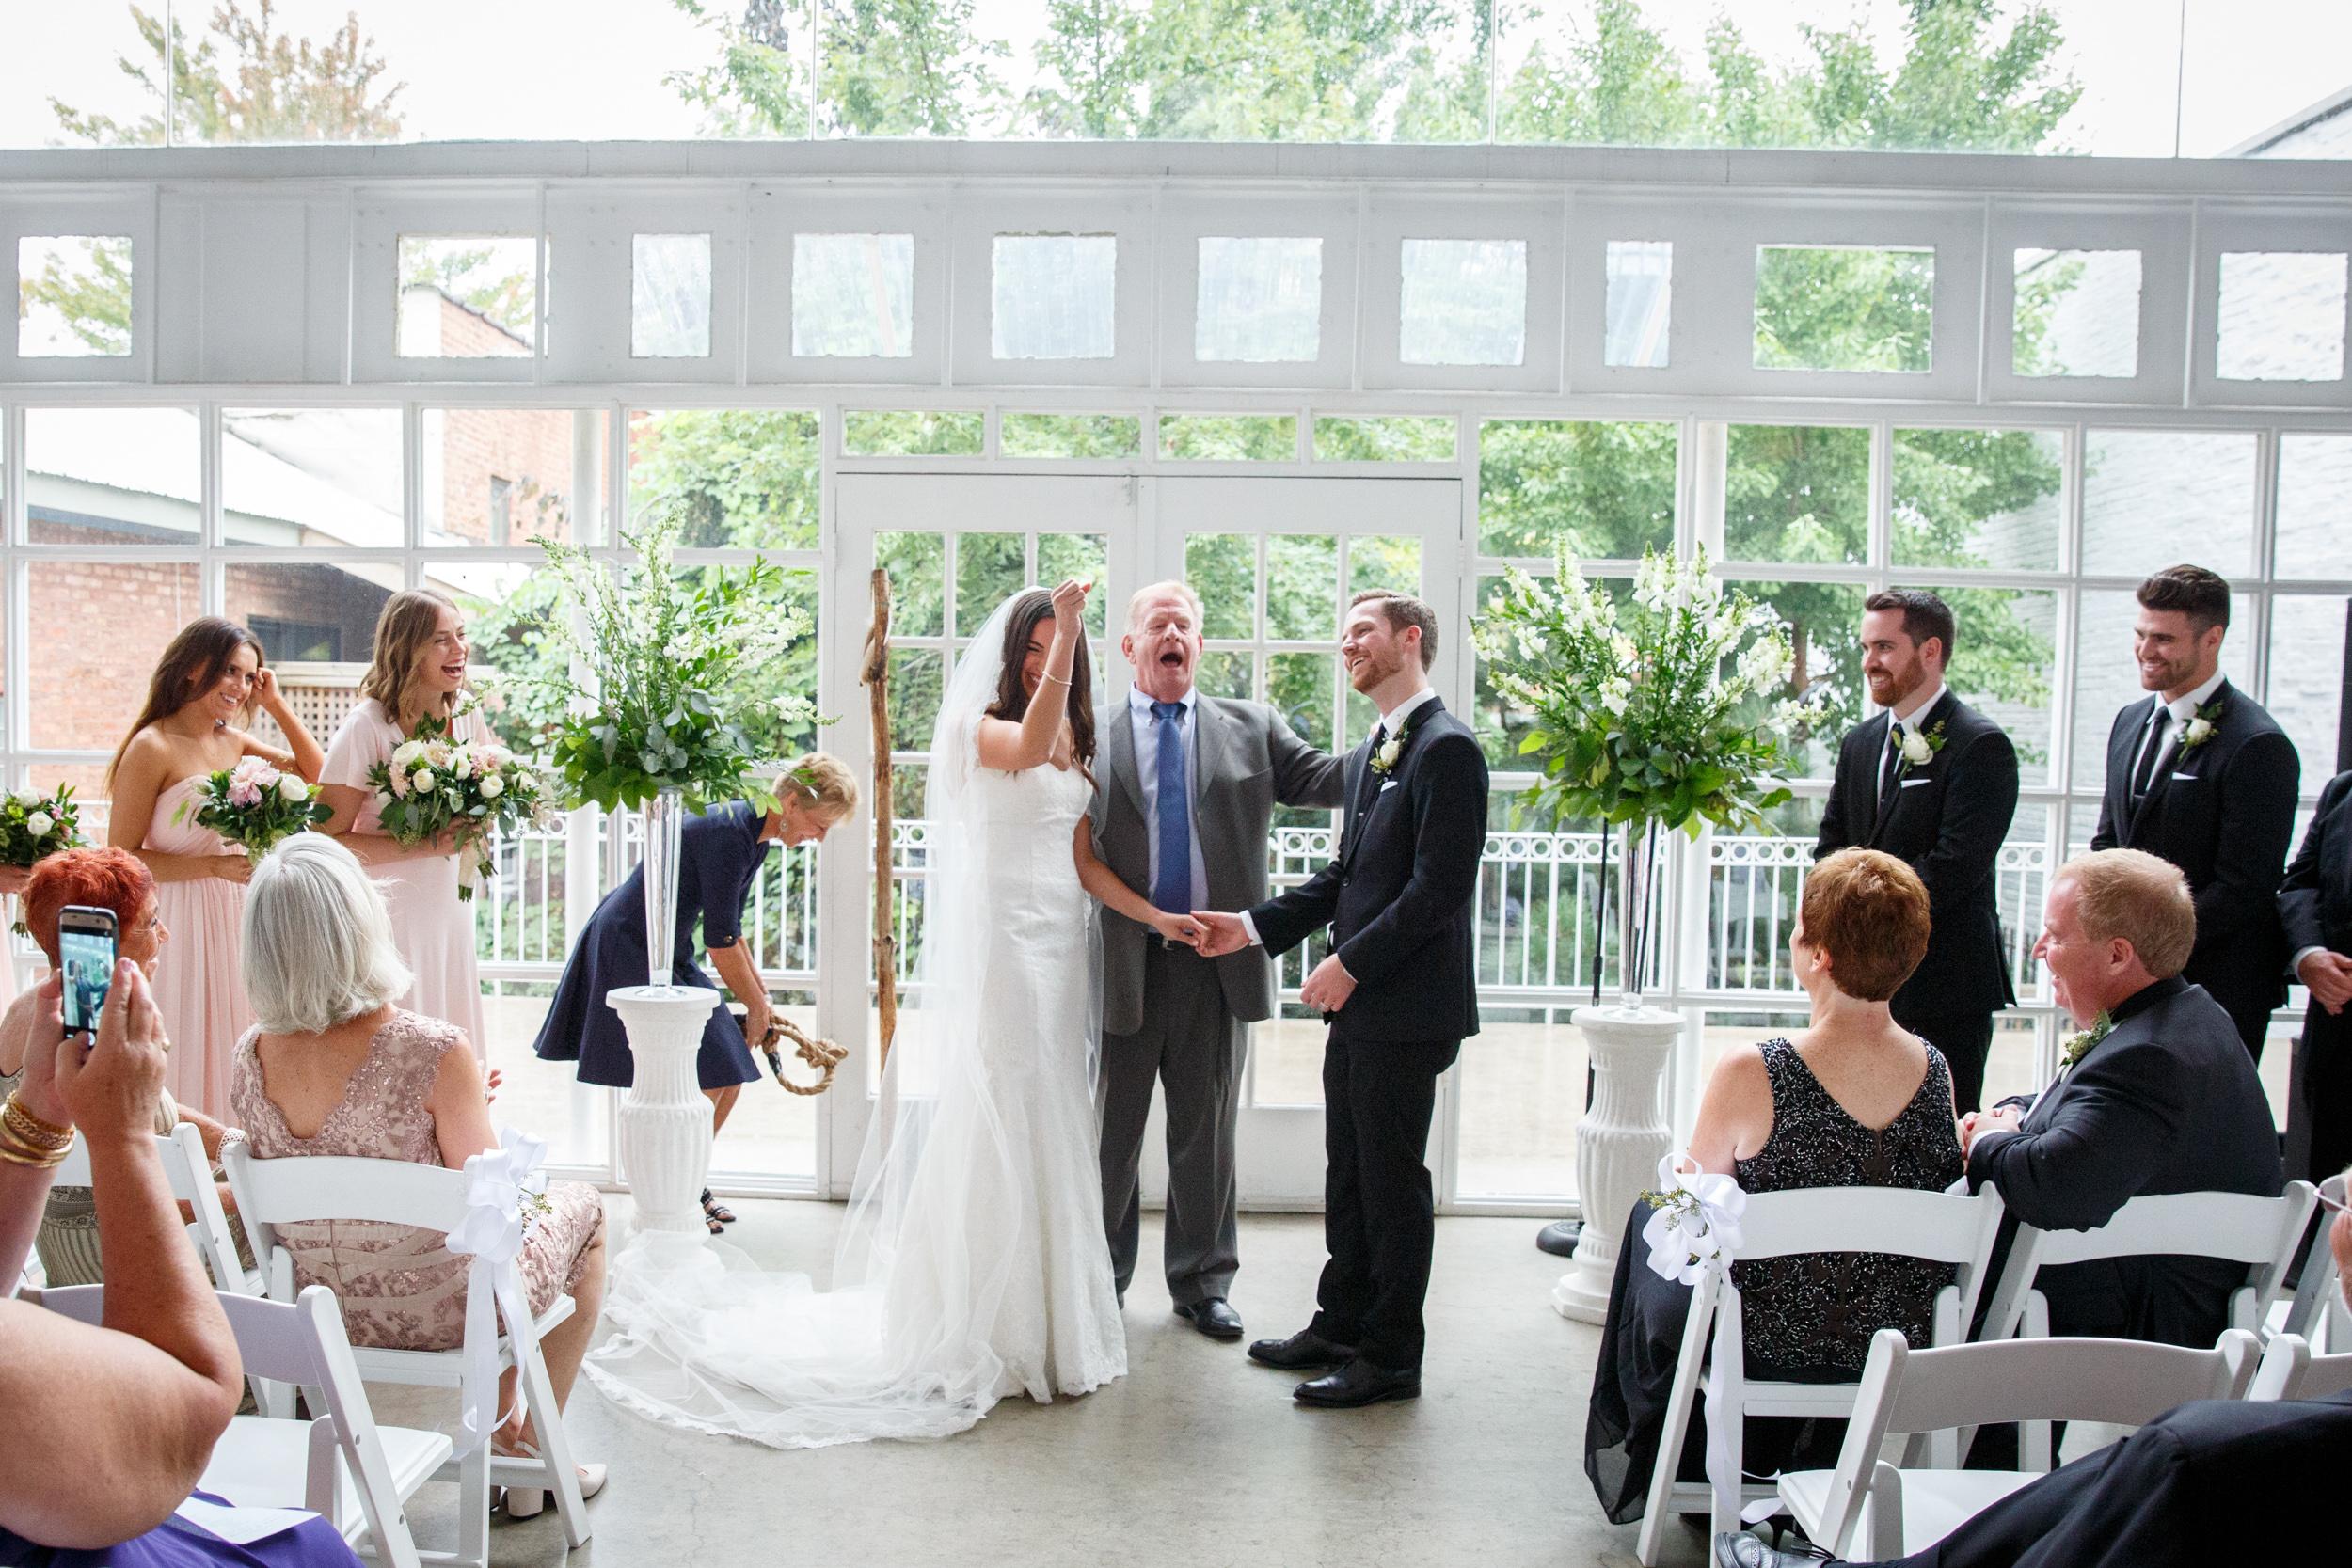 9-09-2016 Flora & Colin wedding photography by Brian Milo-156.jpg